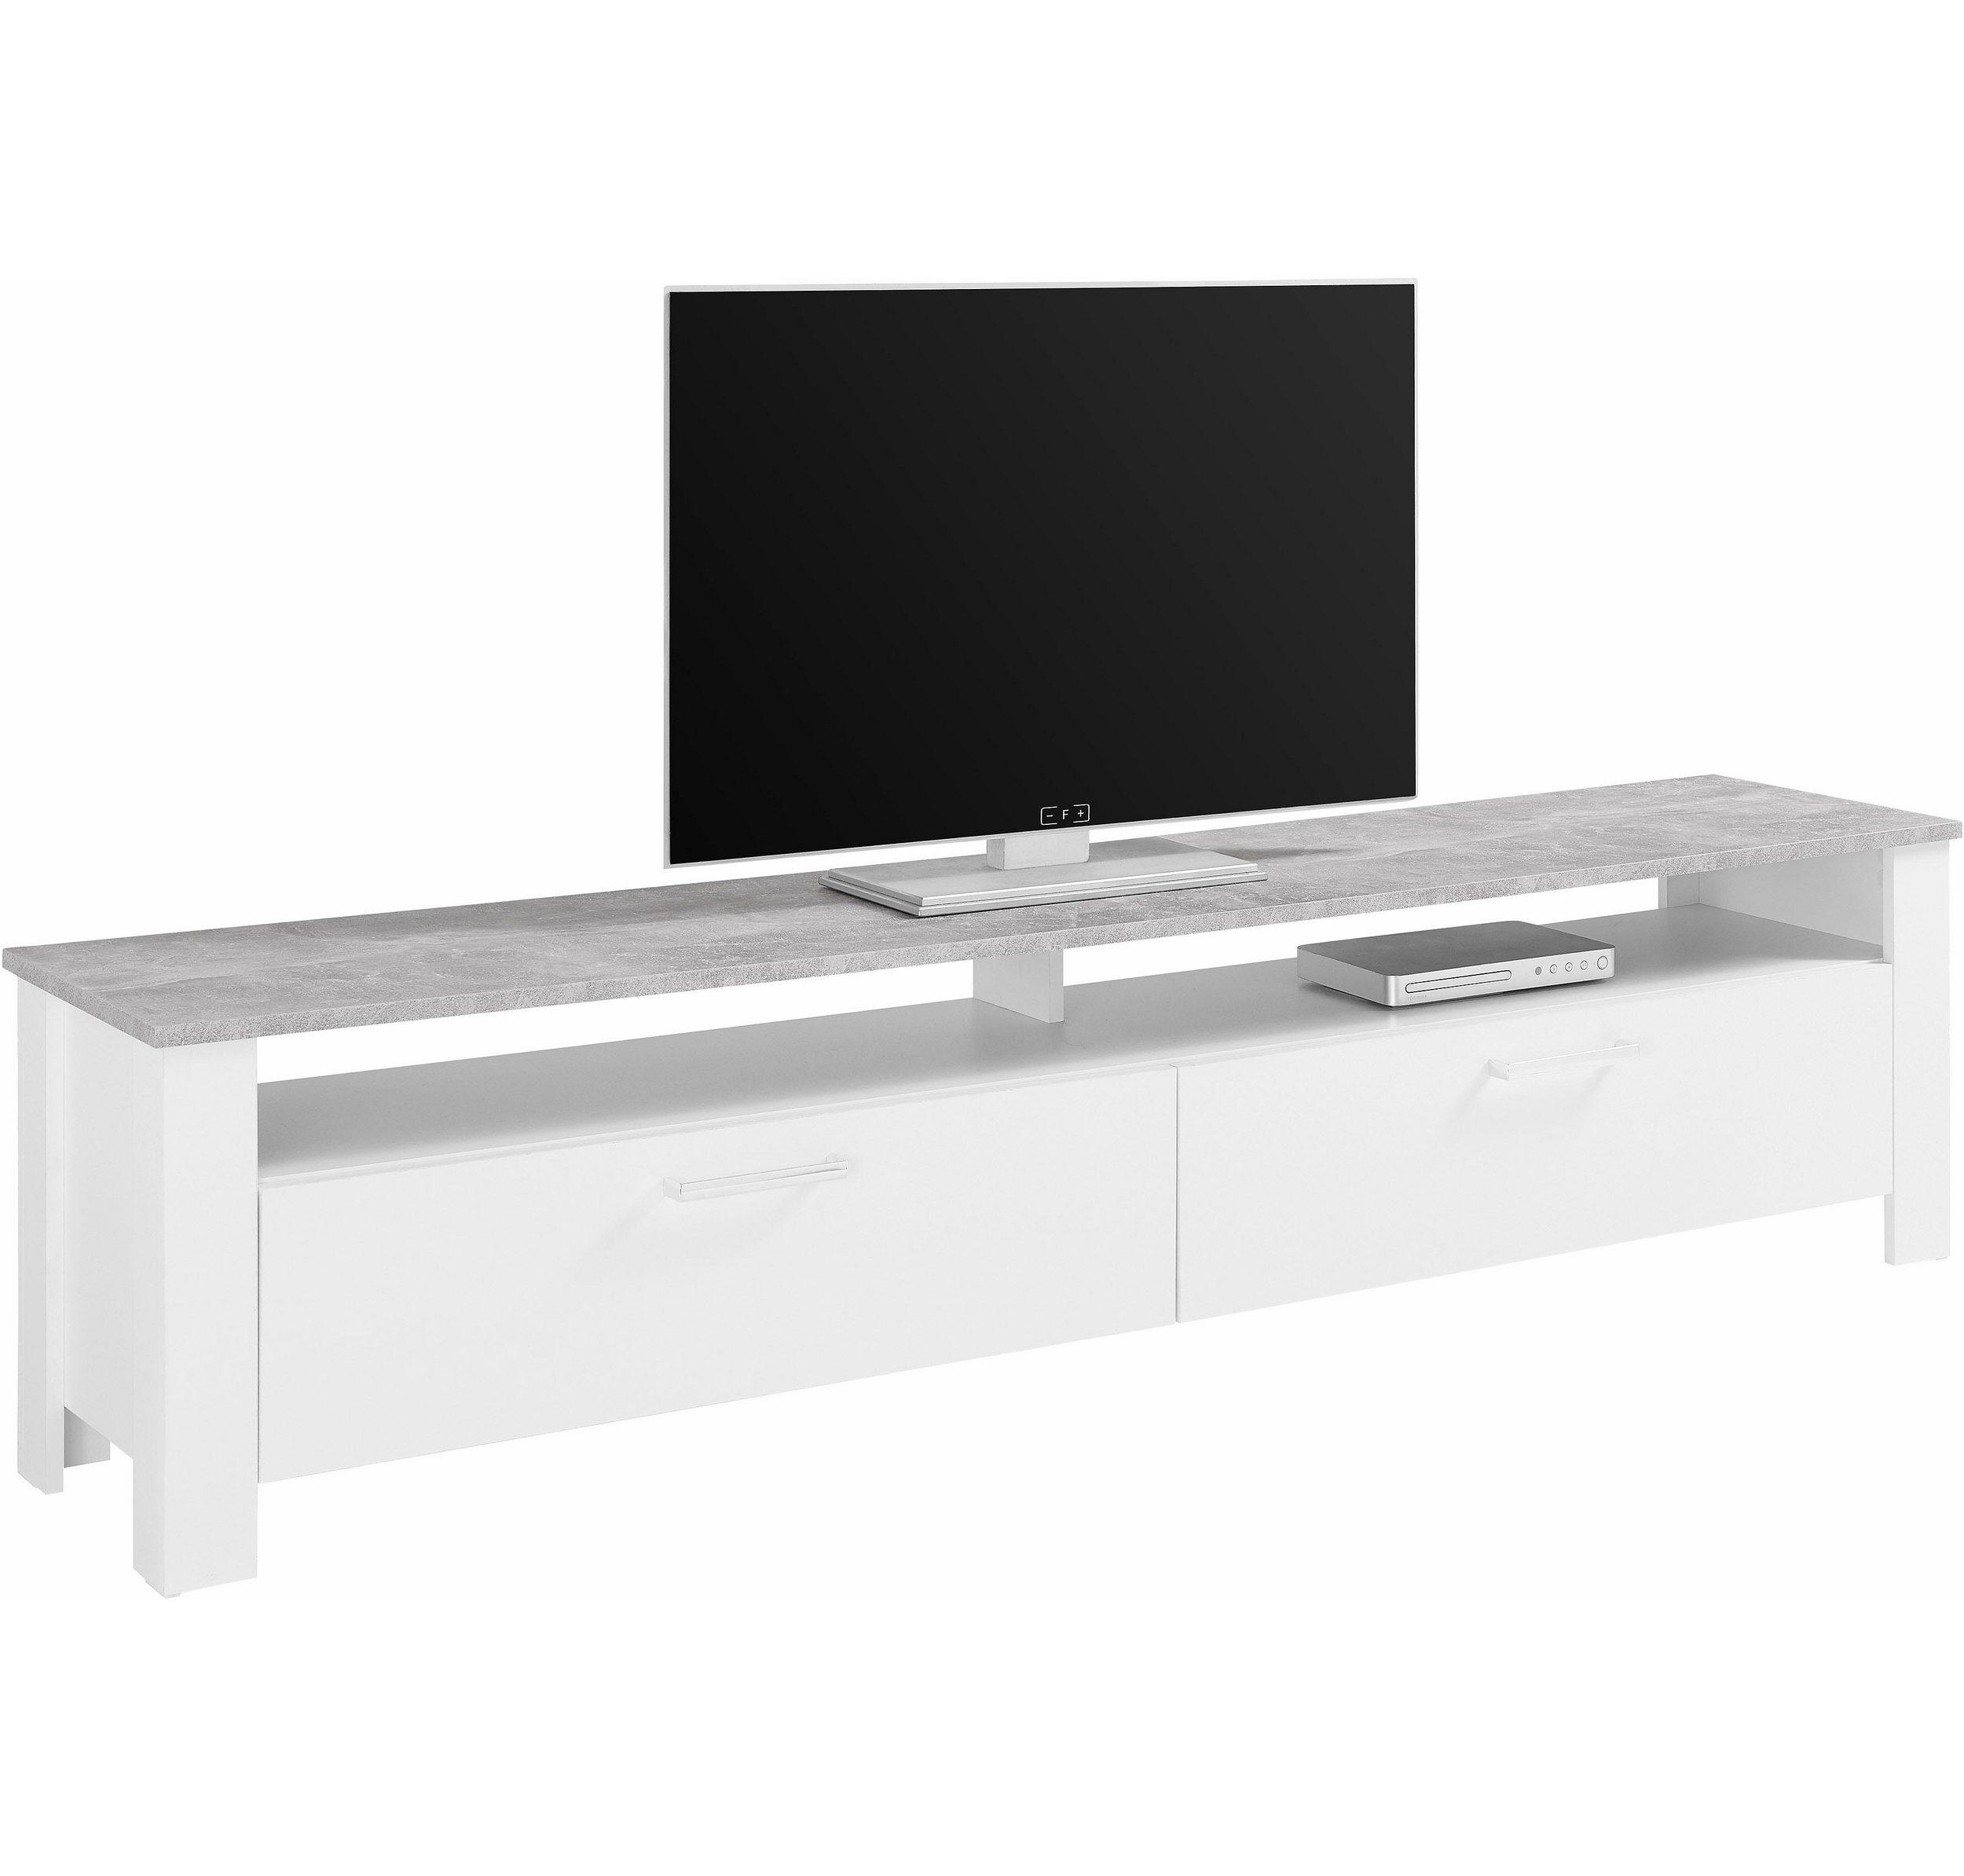 STEINHOFF ZABONA Lowboard - Weiß / Beton-Optik